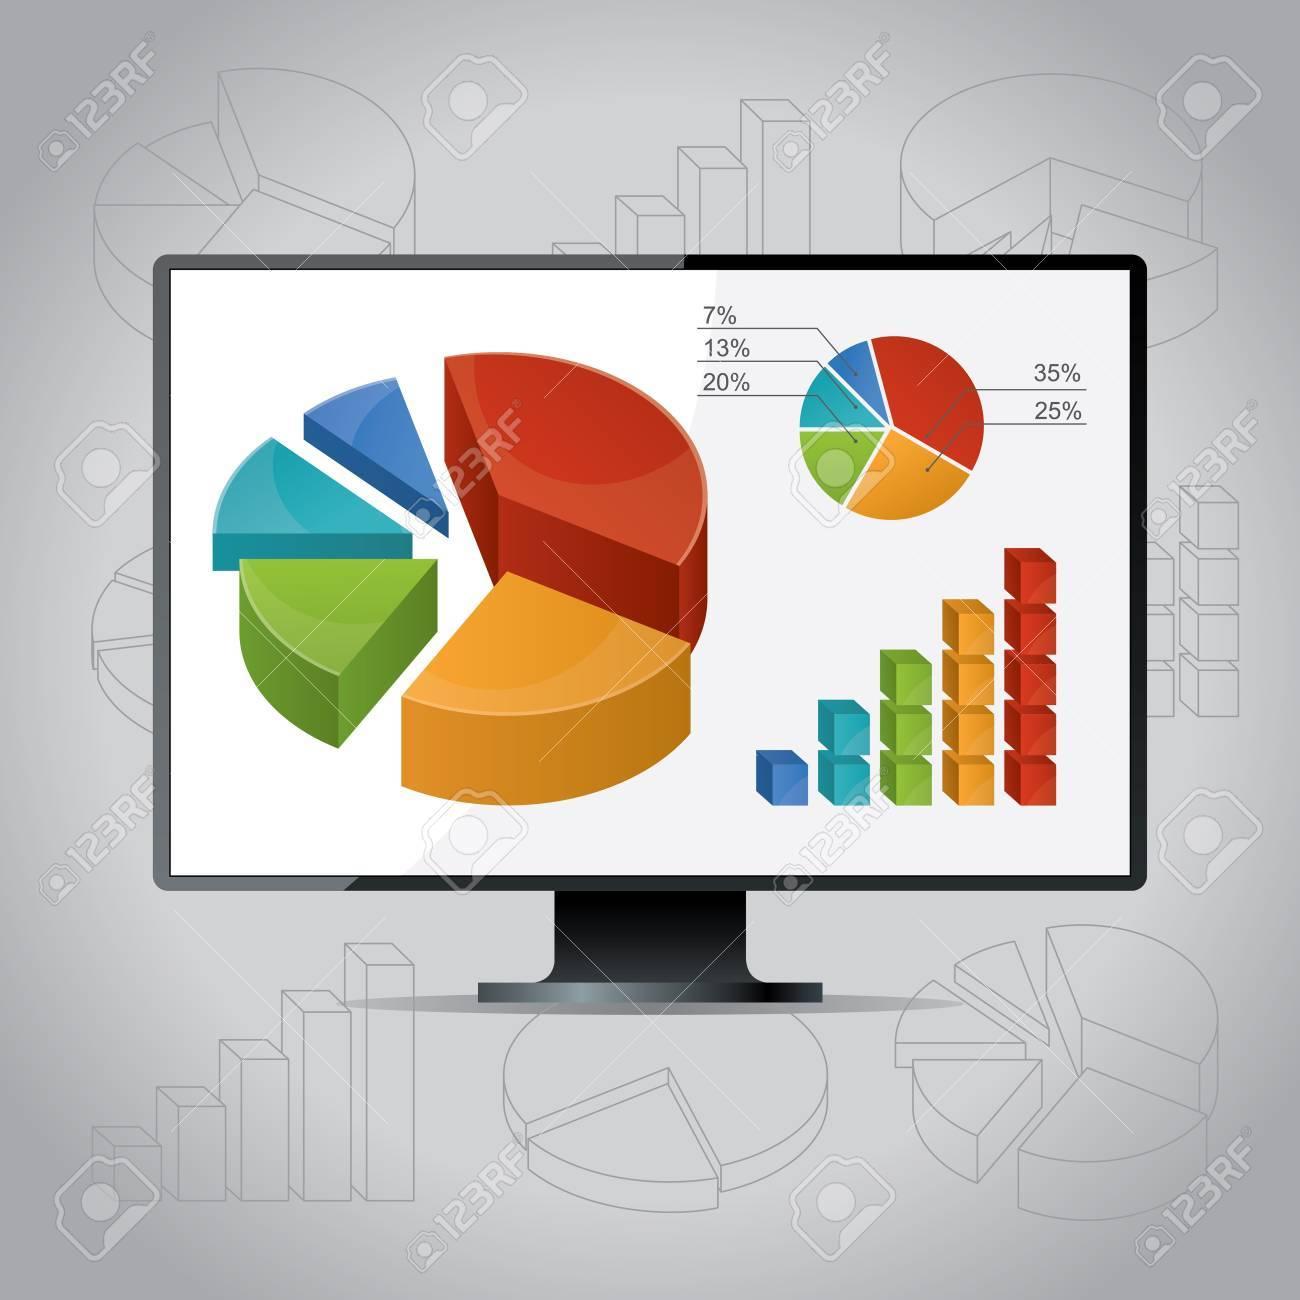 charts, diagrams and graphs. Stock Vector - 17901089